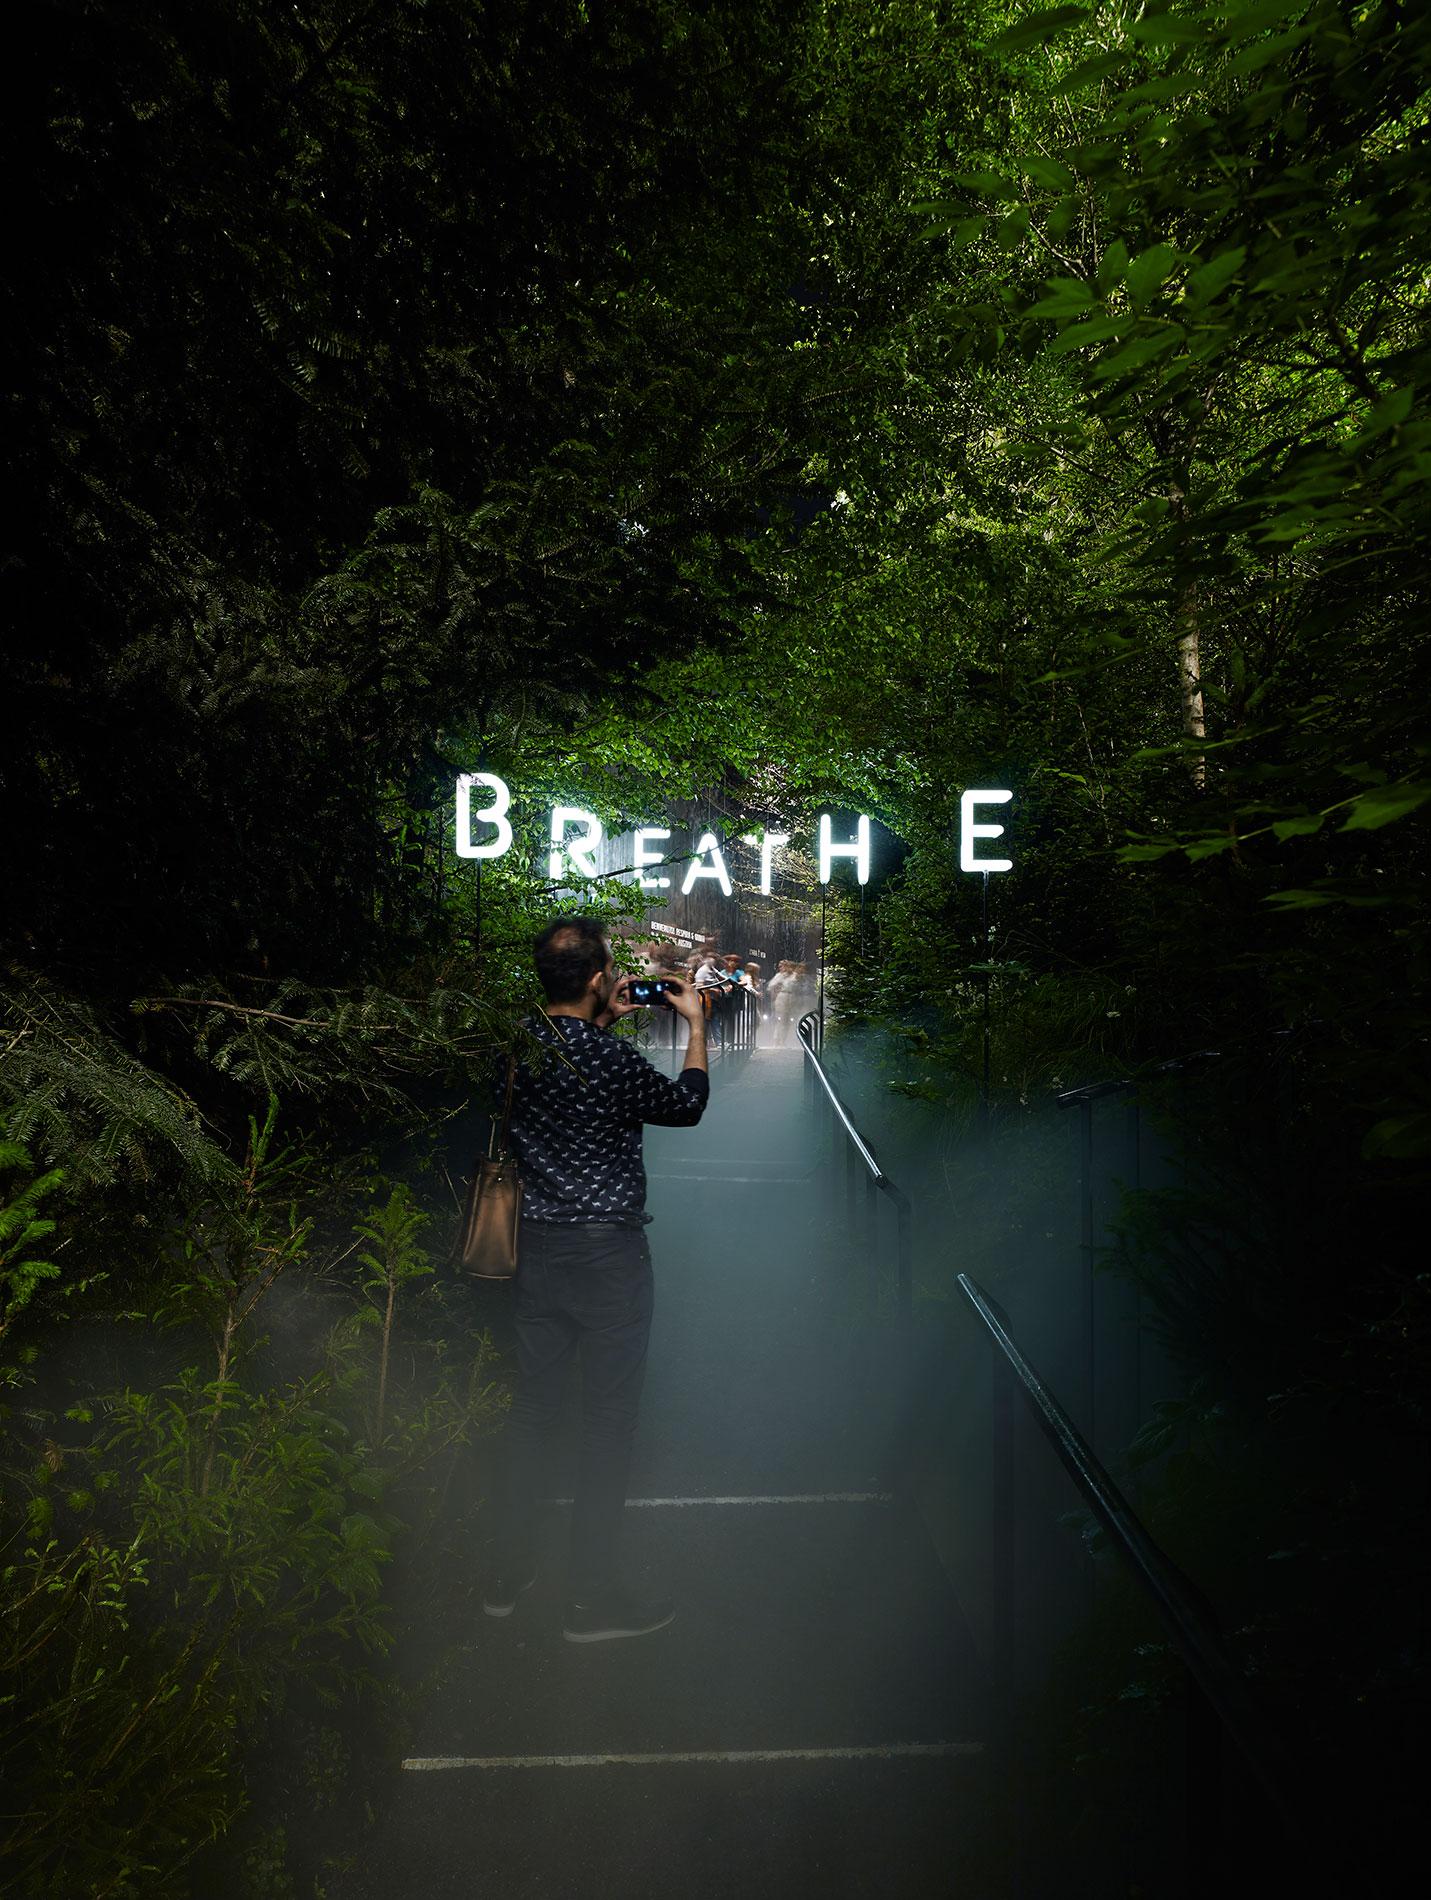 breathe expo photo